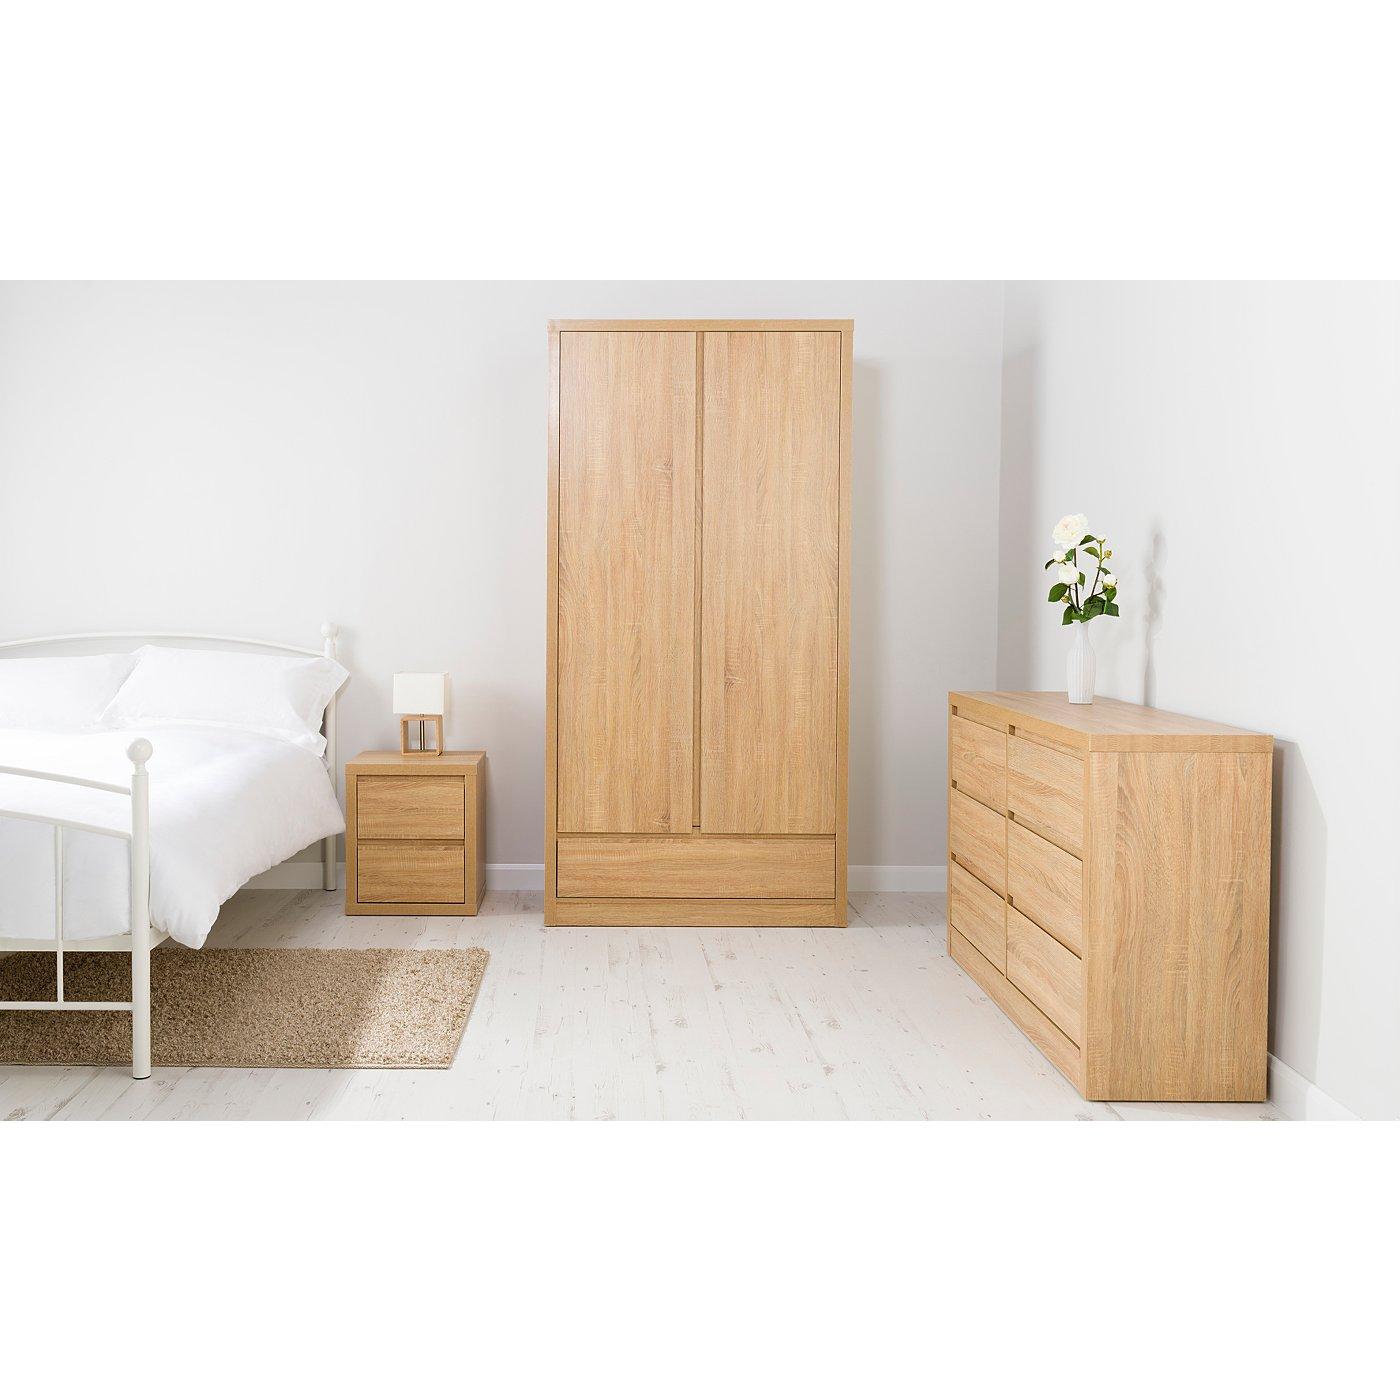 George Home Leighton Bedroom Furniture Range   Oak Effect  Loading zoom. George Home Leighton Bedroom Furniture Range   Oak Effect   Chest